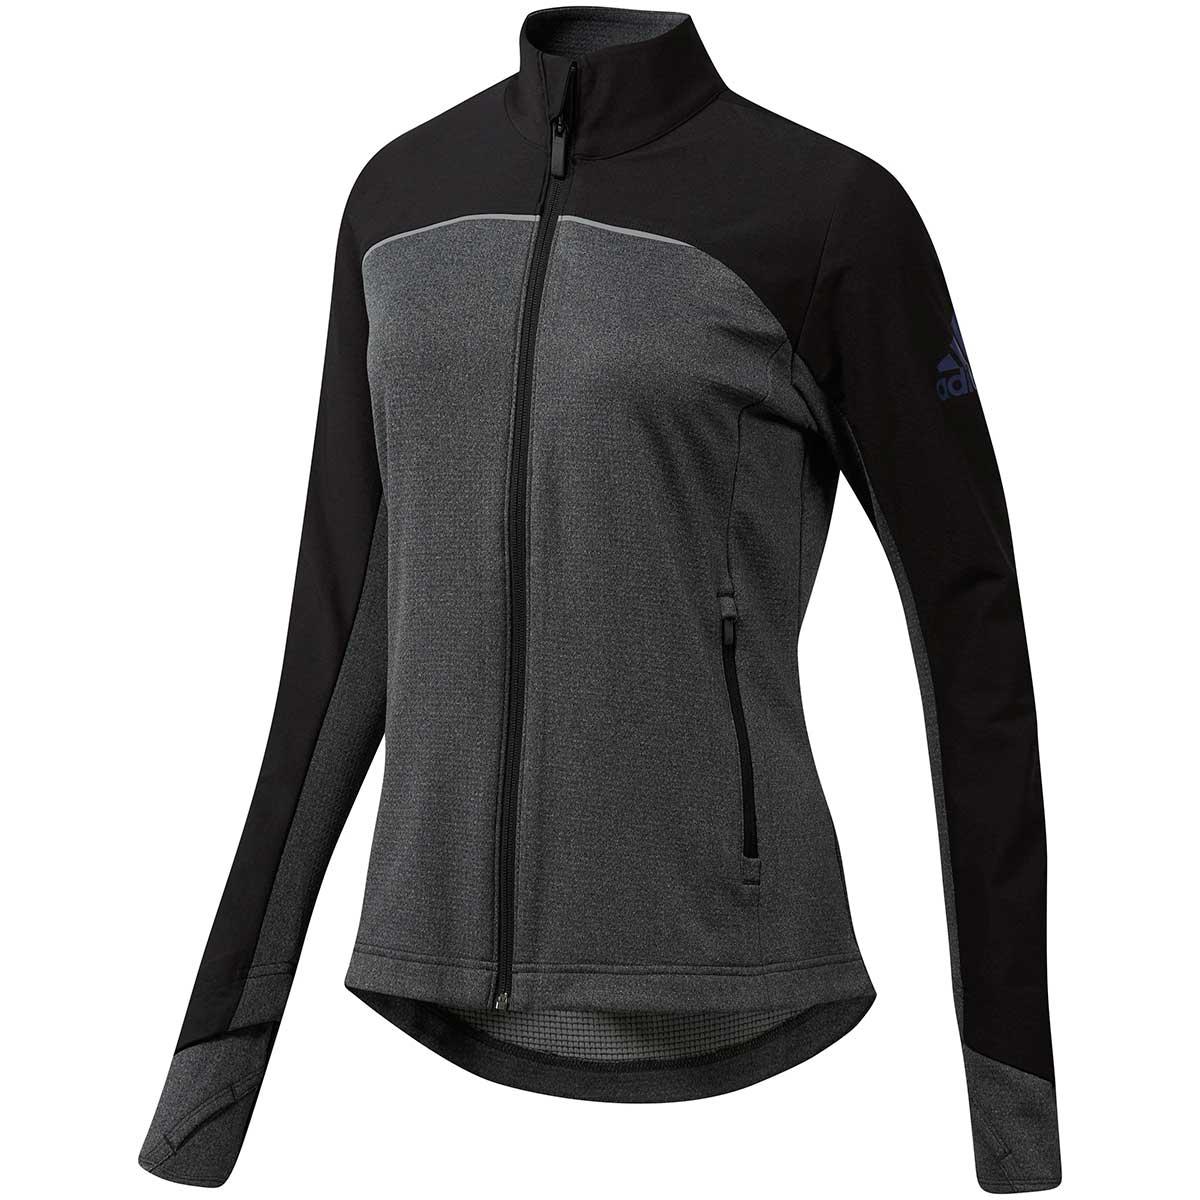 Adidas Women's Go-To Adapt Full Zip Jacket - Black